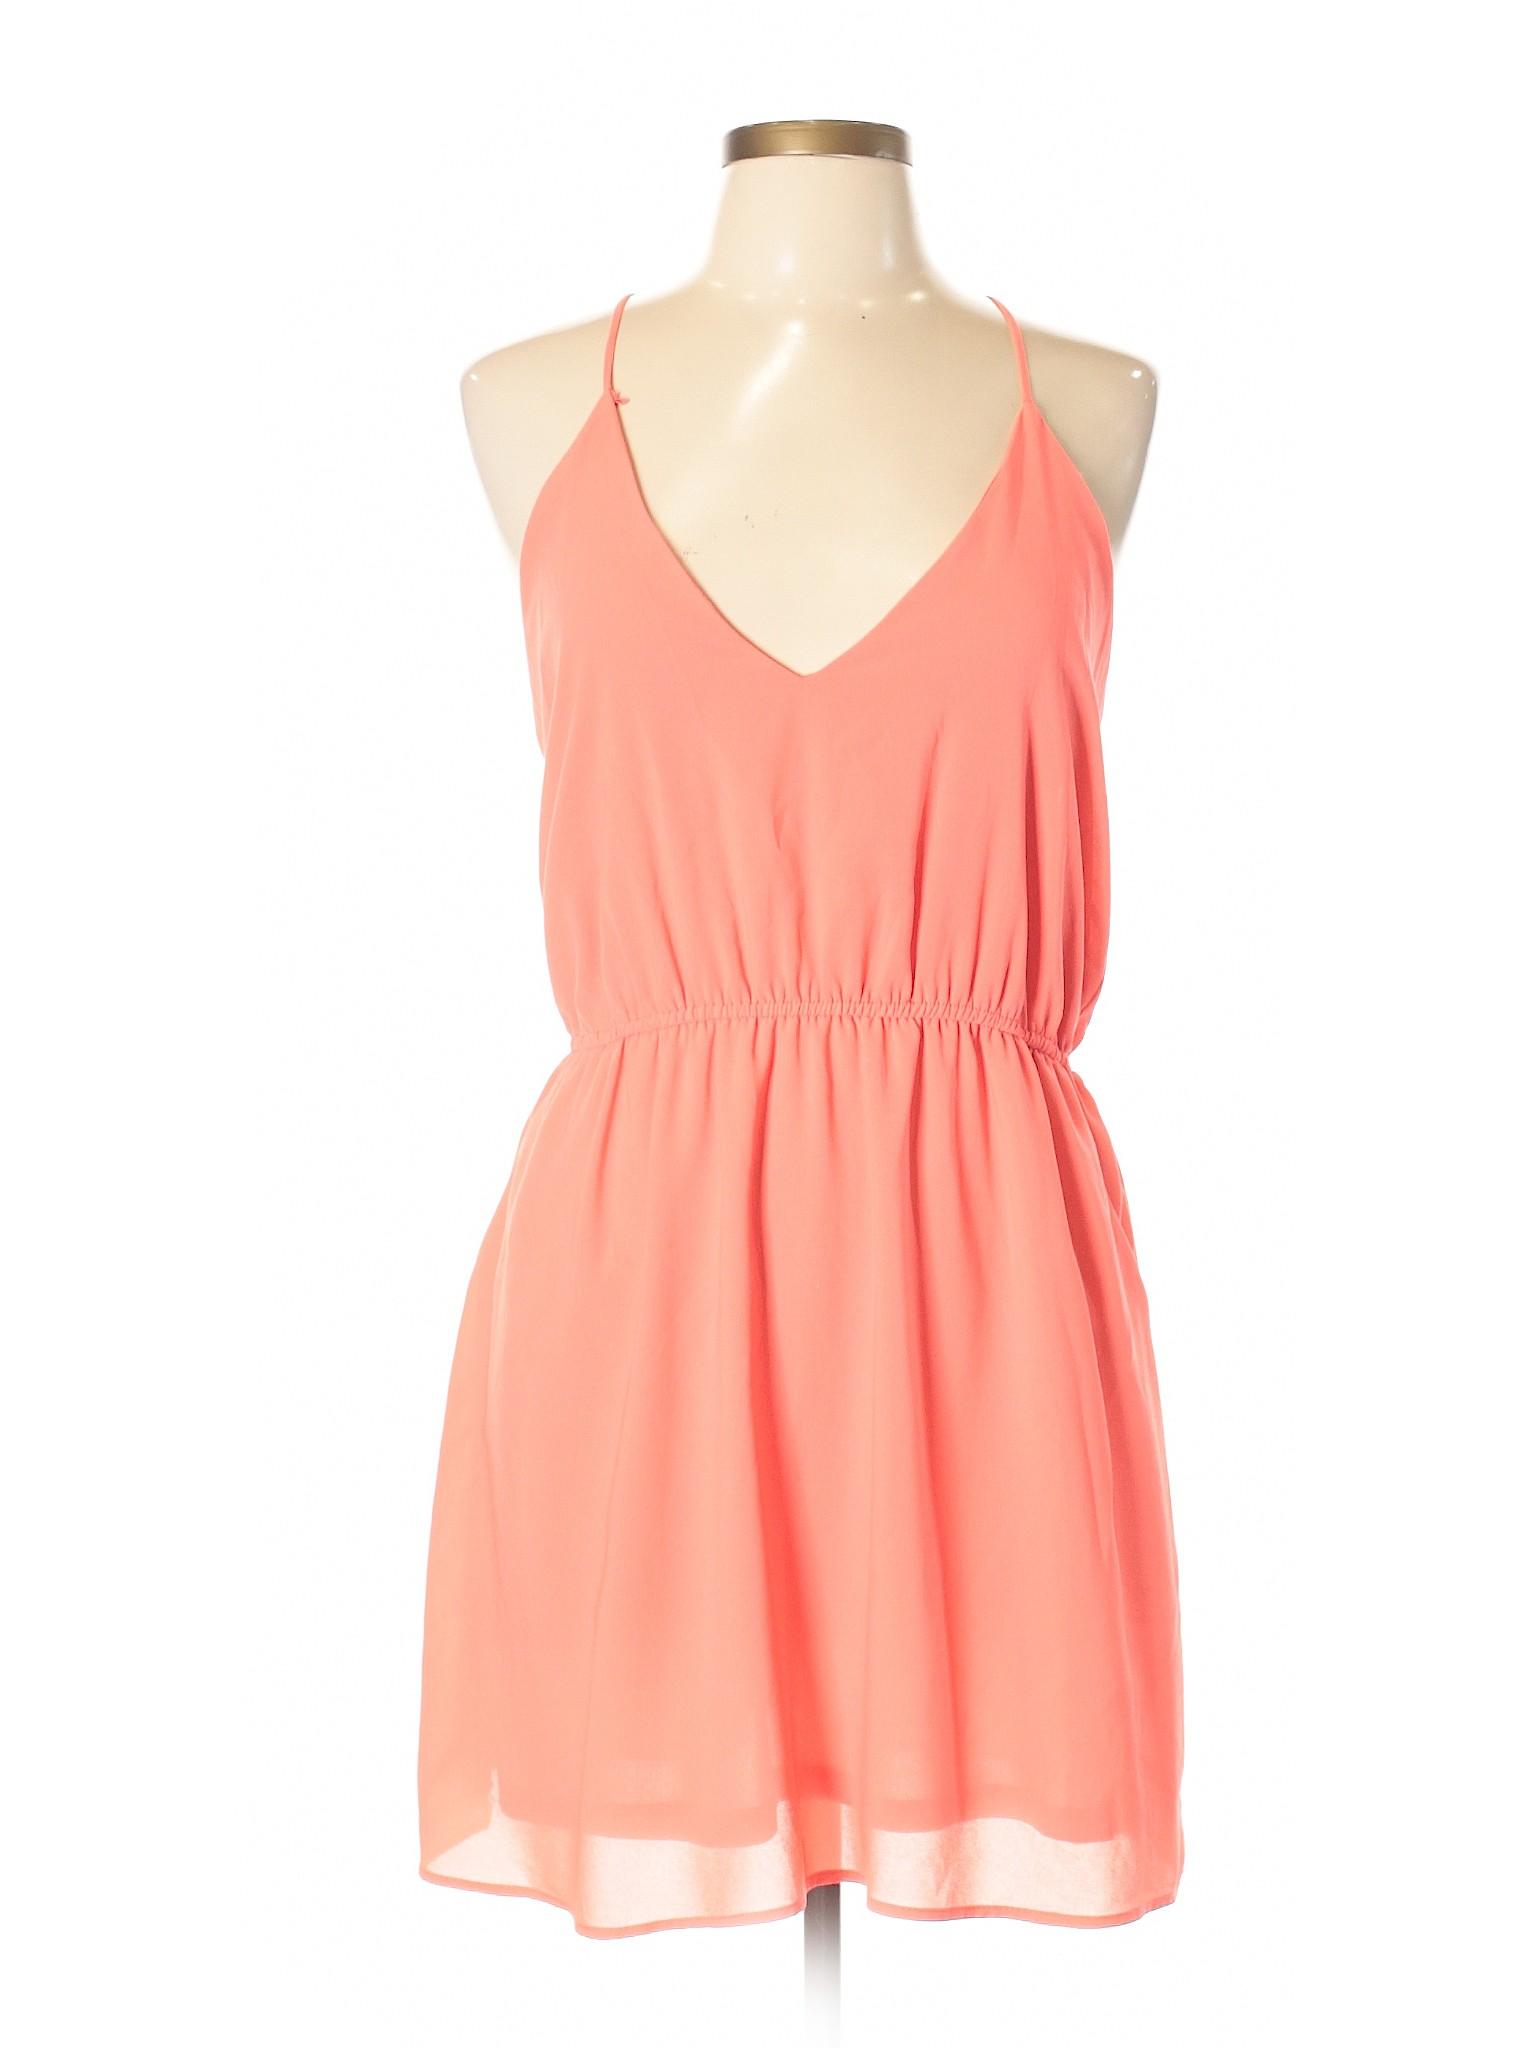 Dress Casual Selling J J Dress Very Casual Very Selling Selling Selling Very Dress J Casual Very Casual J FwCAWq